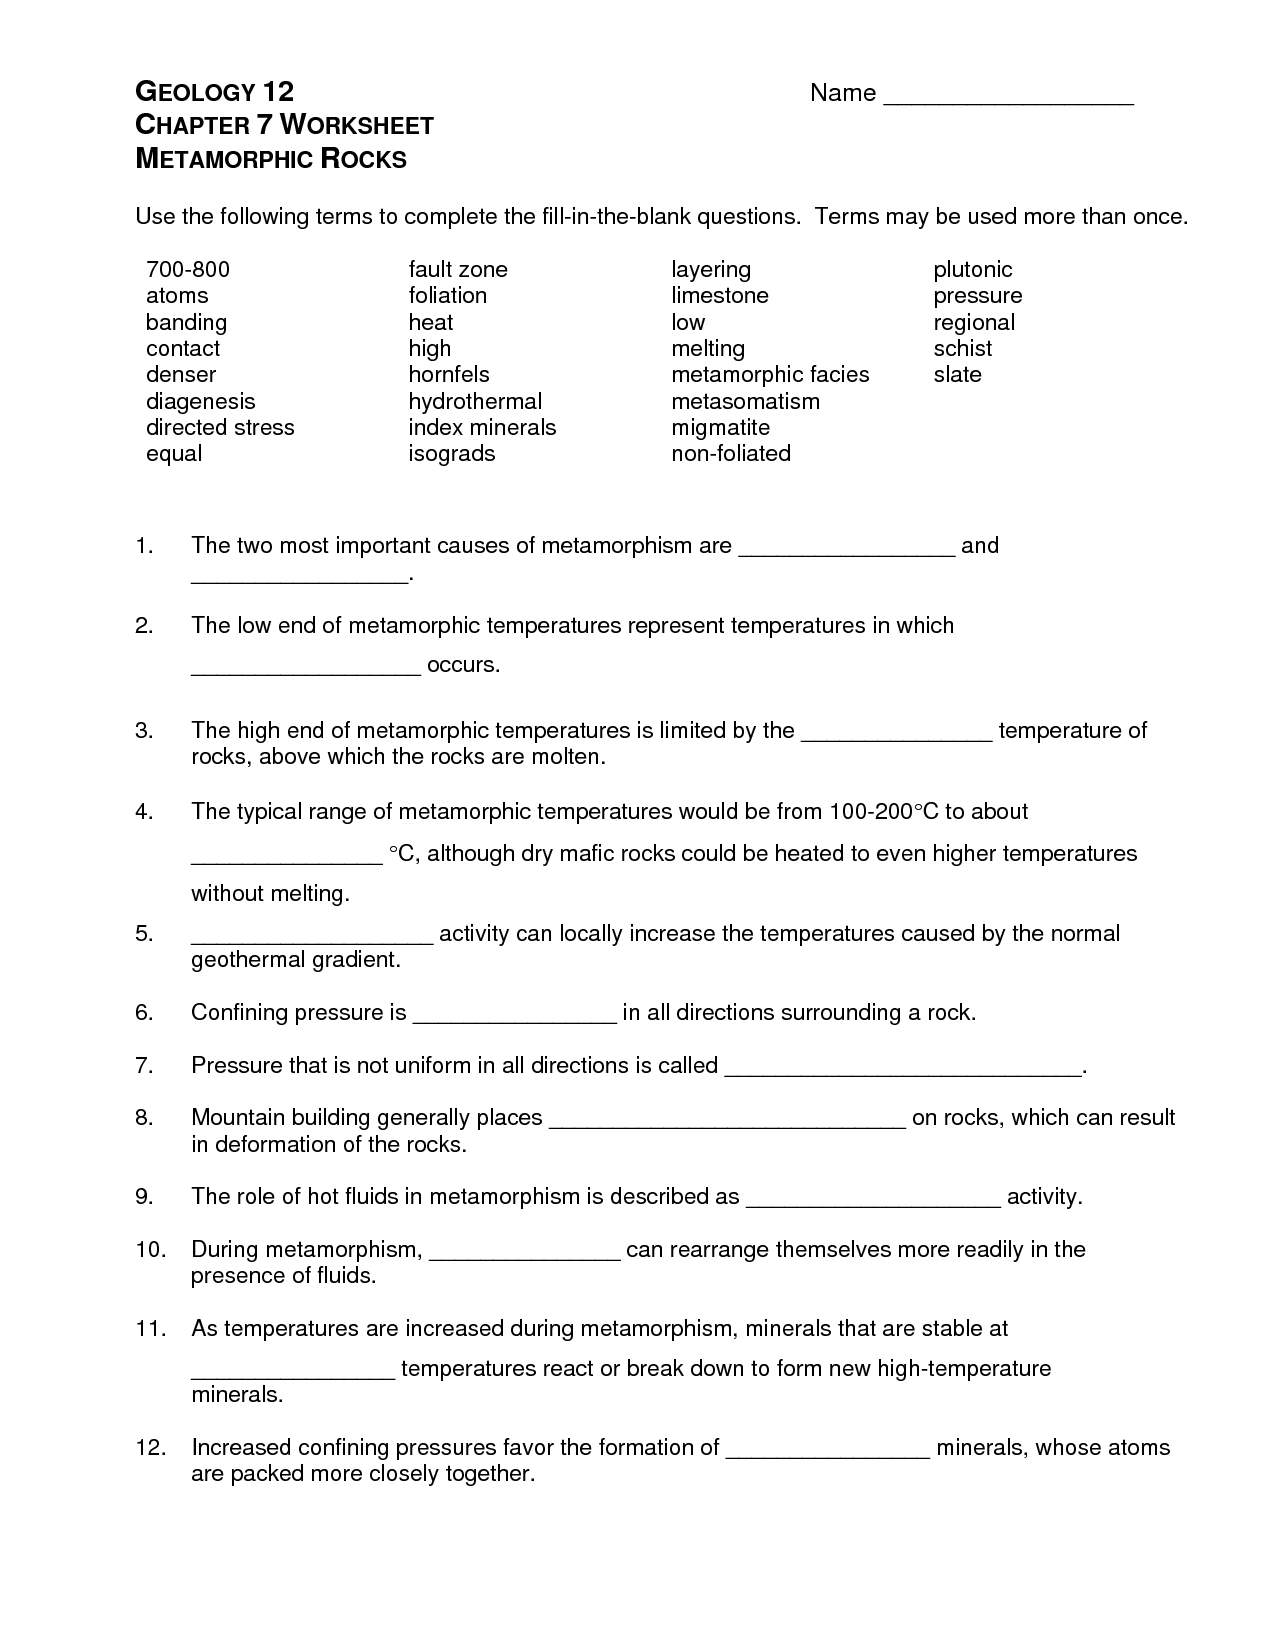 35 Sedimentary Rocks Worksheet Answers